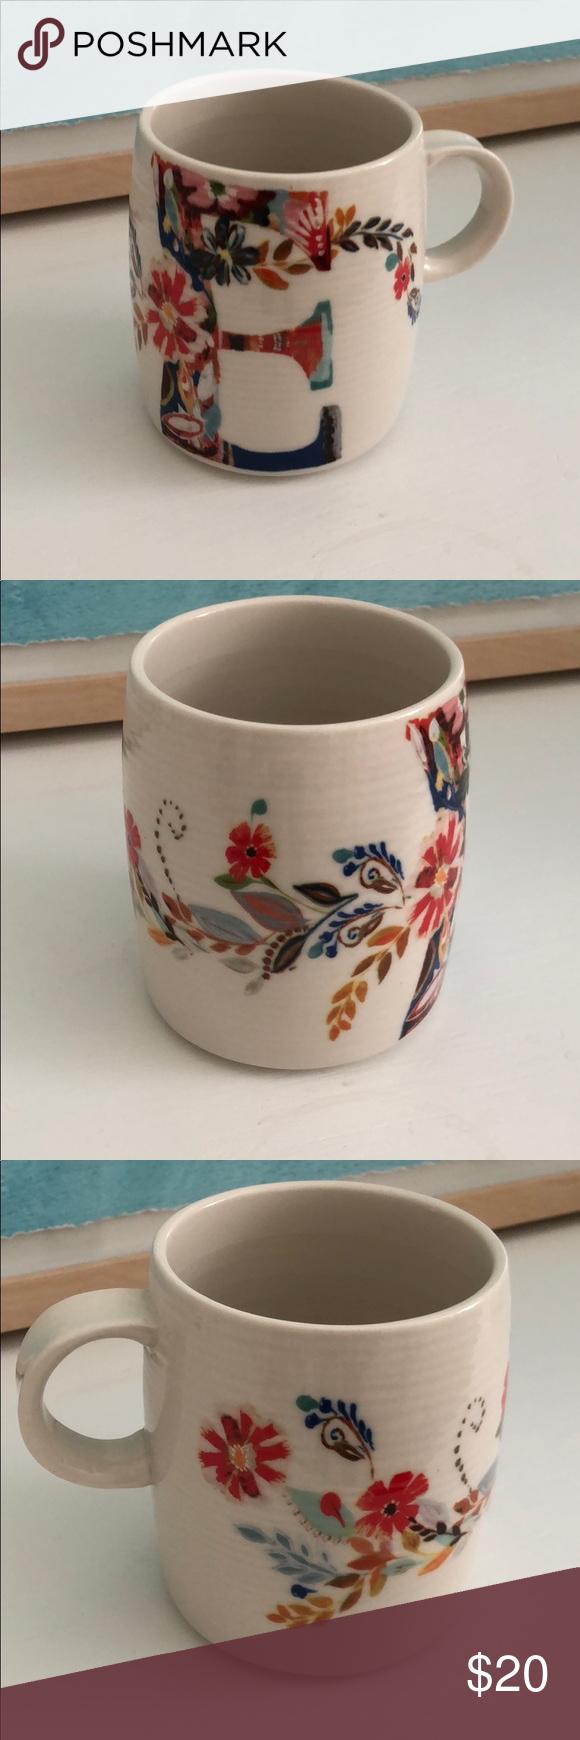 "New Anthropologie Starla Halfmann ""E"" coffee cup New"